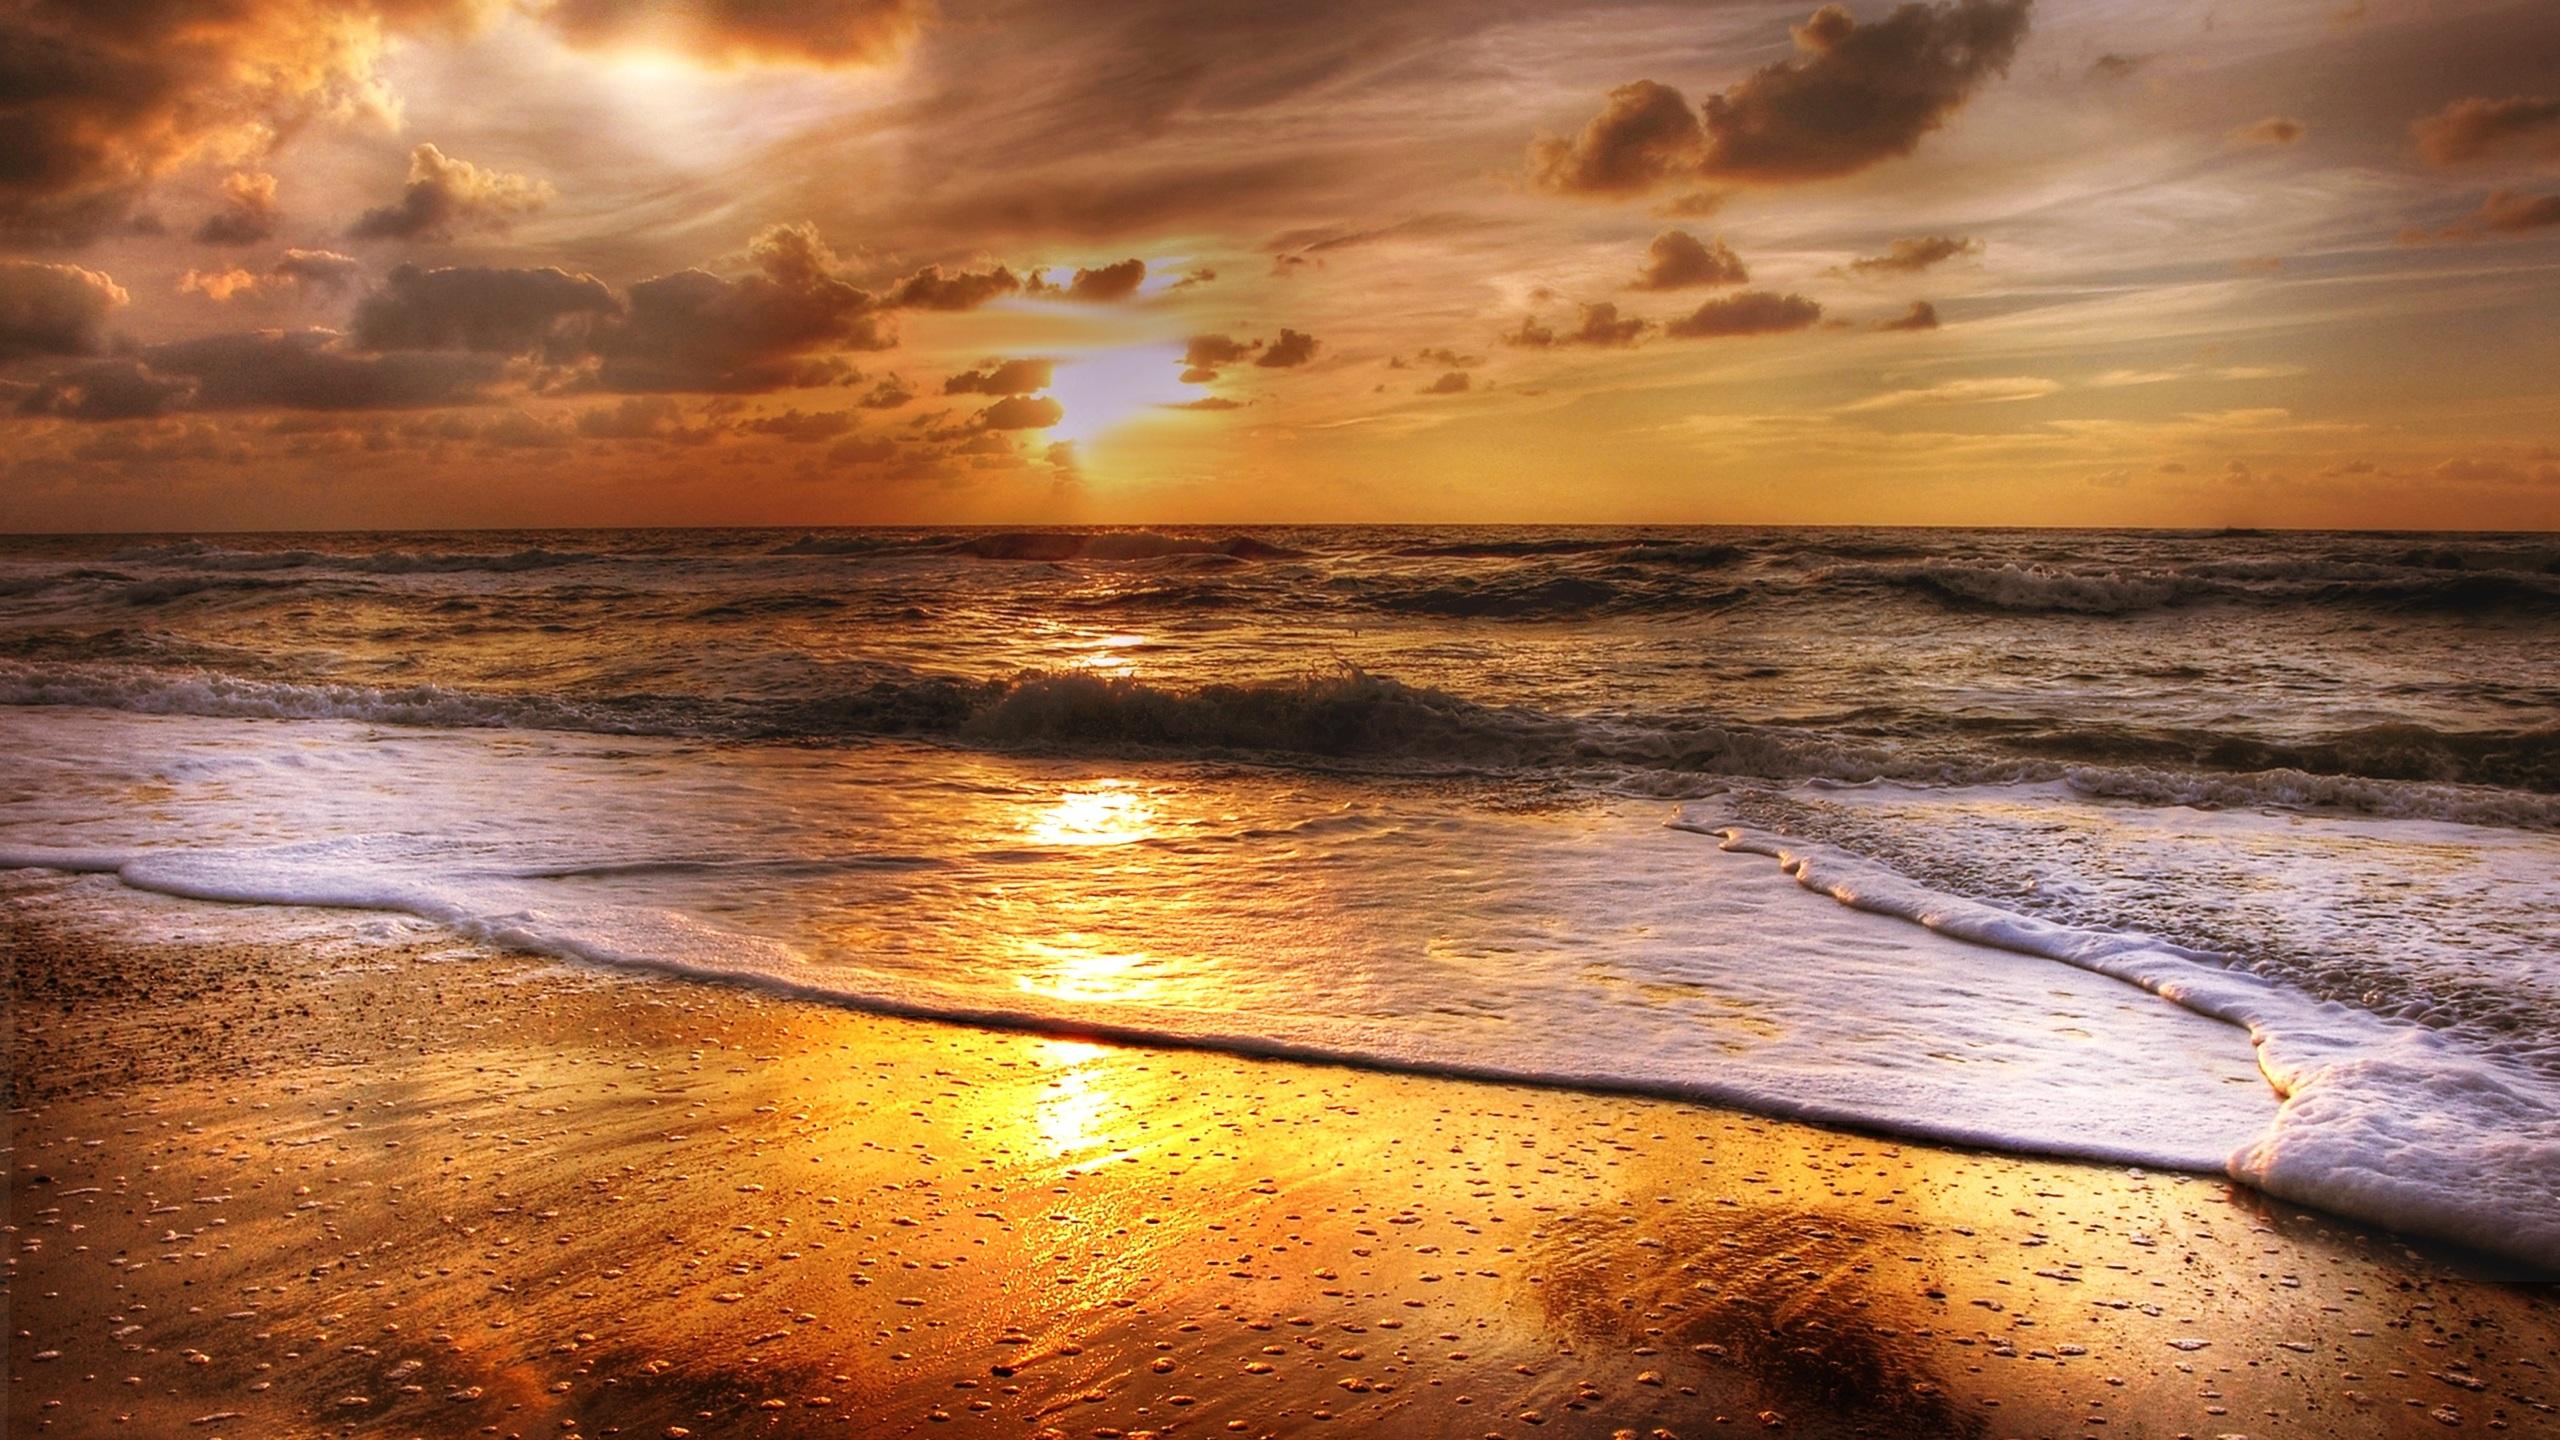 2560x1440 Sunset Beach Sea Sun Clouds 1440P Resolution HD